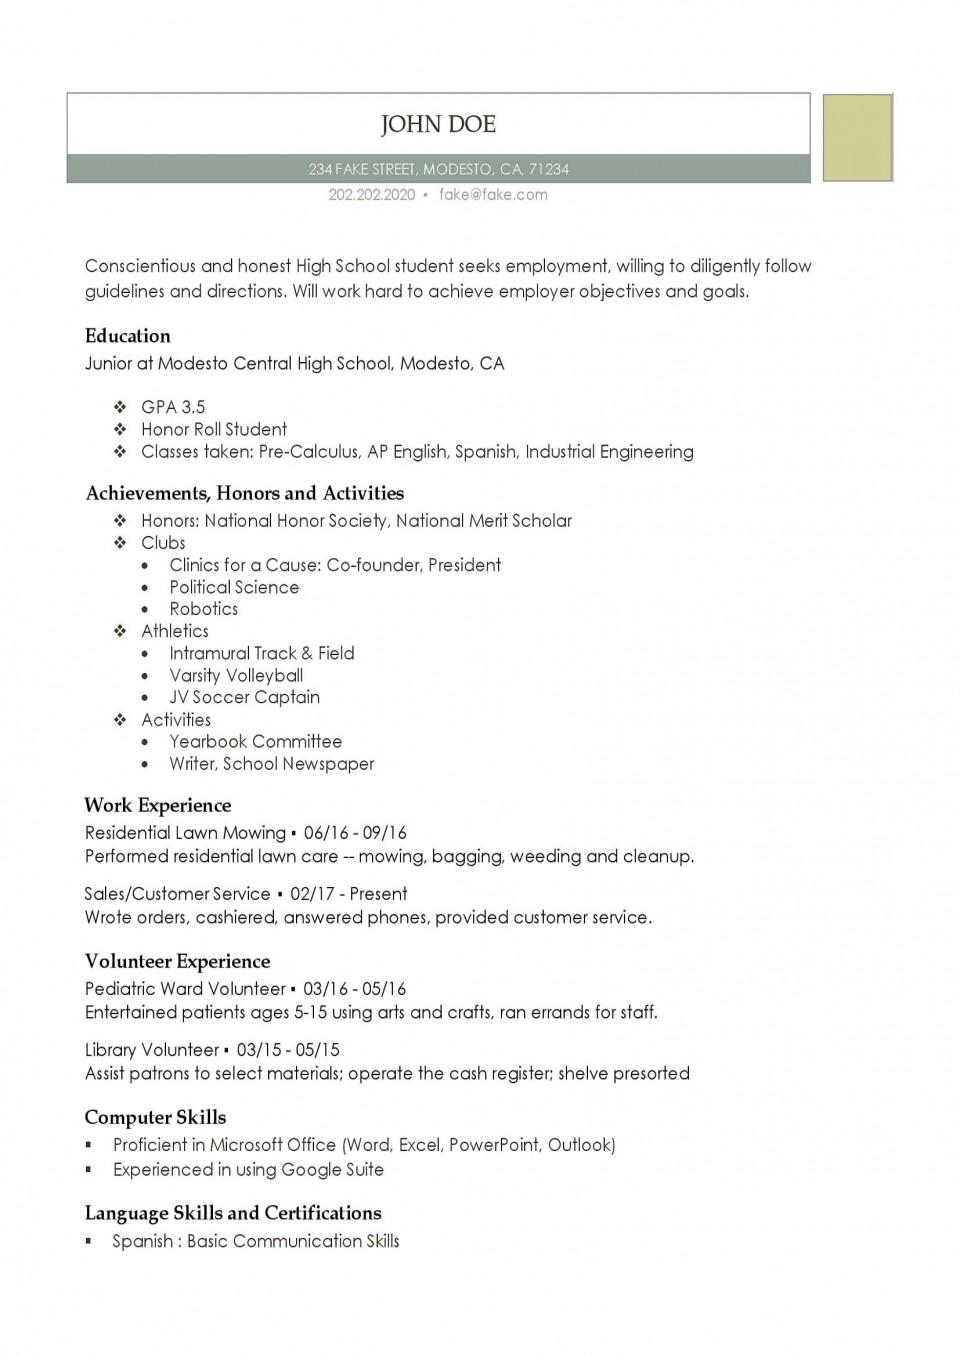 001 Formidable Resume Template High School Resolution  Student Australia For Google Doc Graduate Microsoft Word960